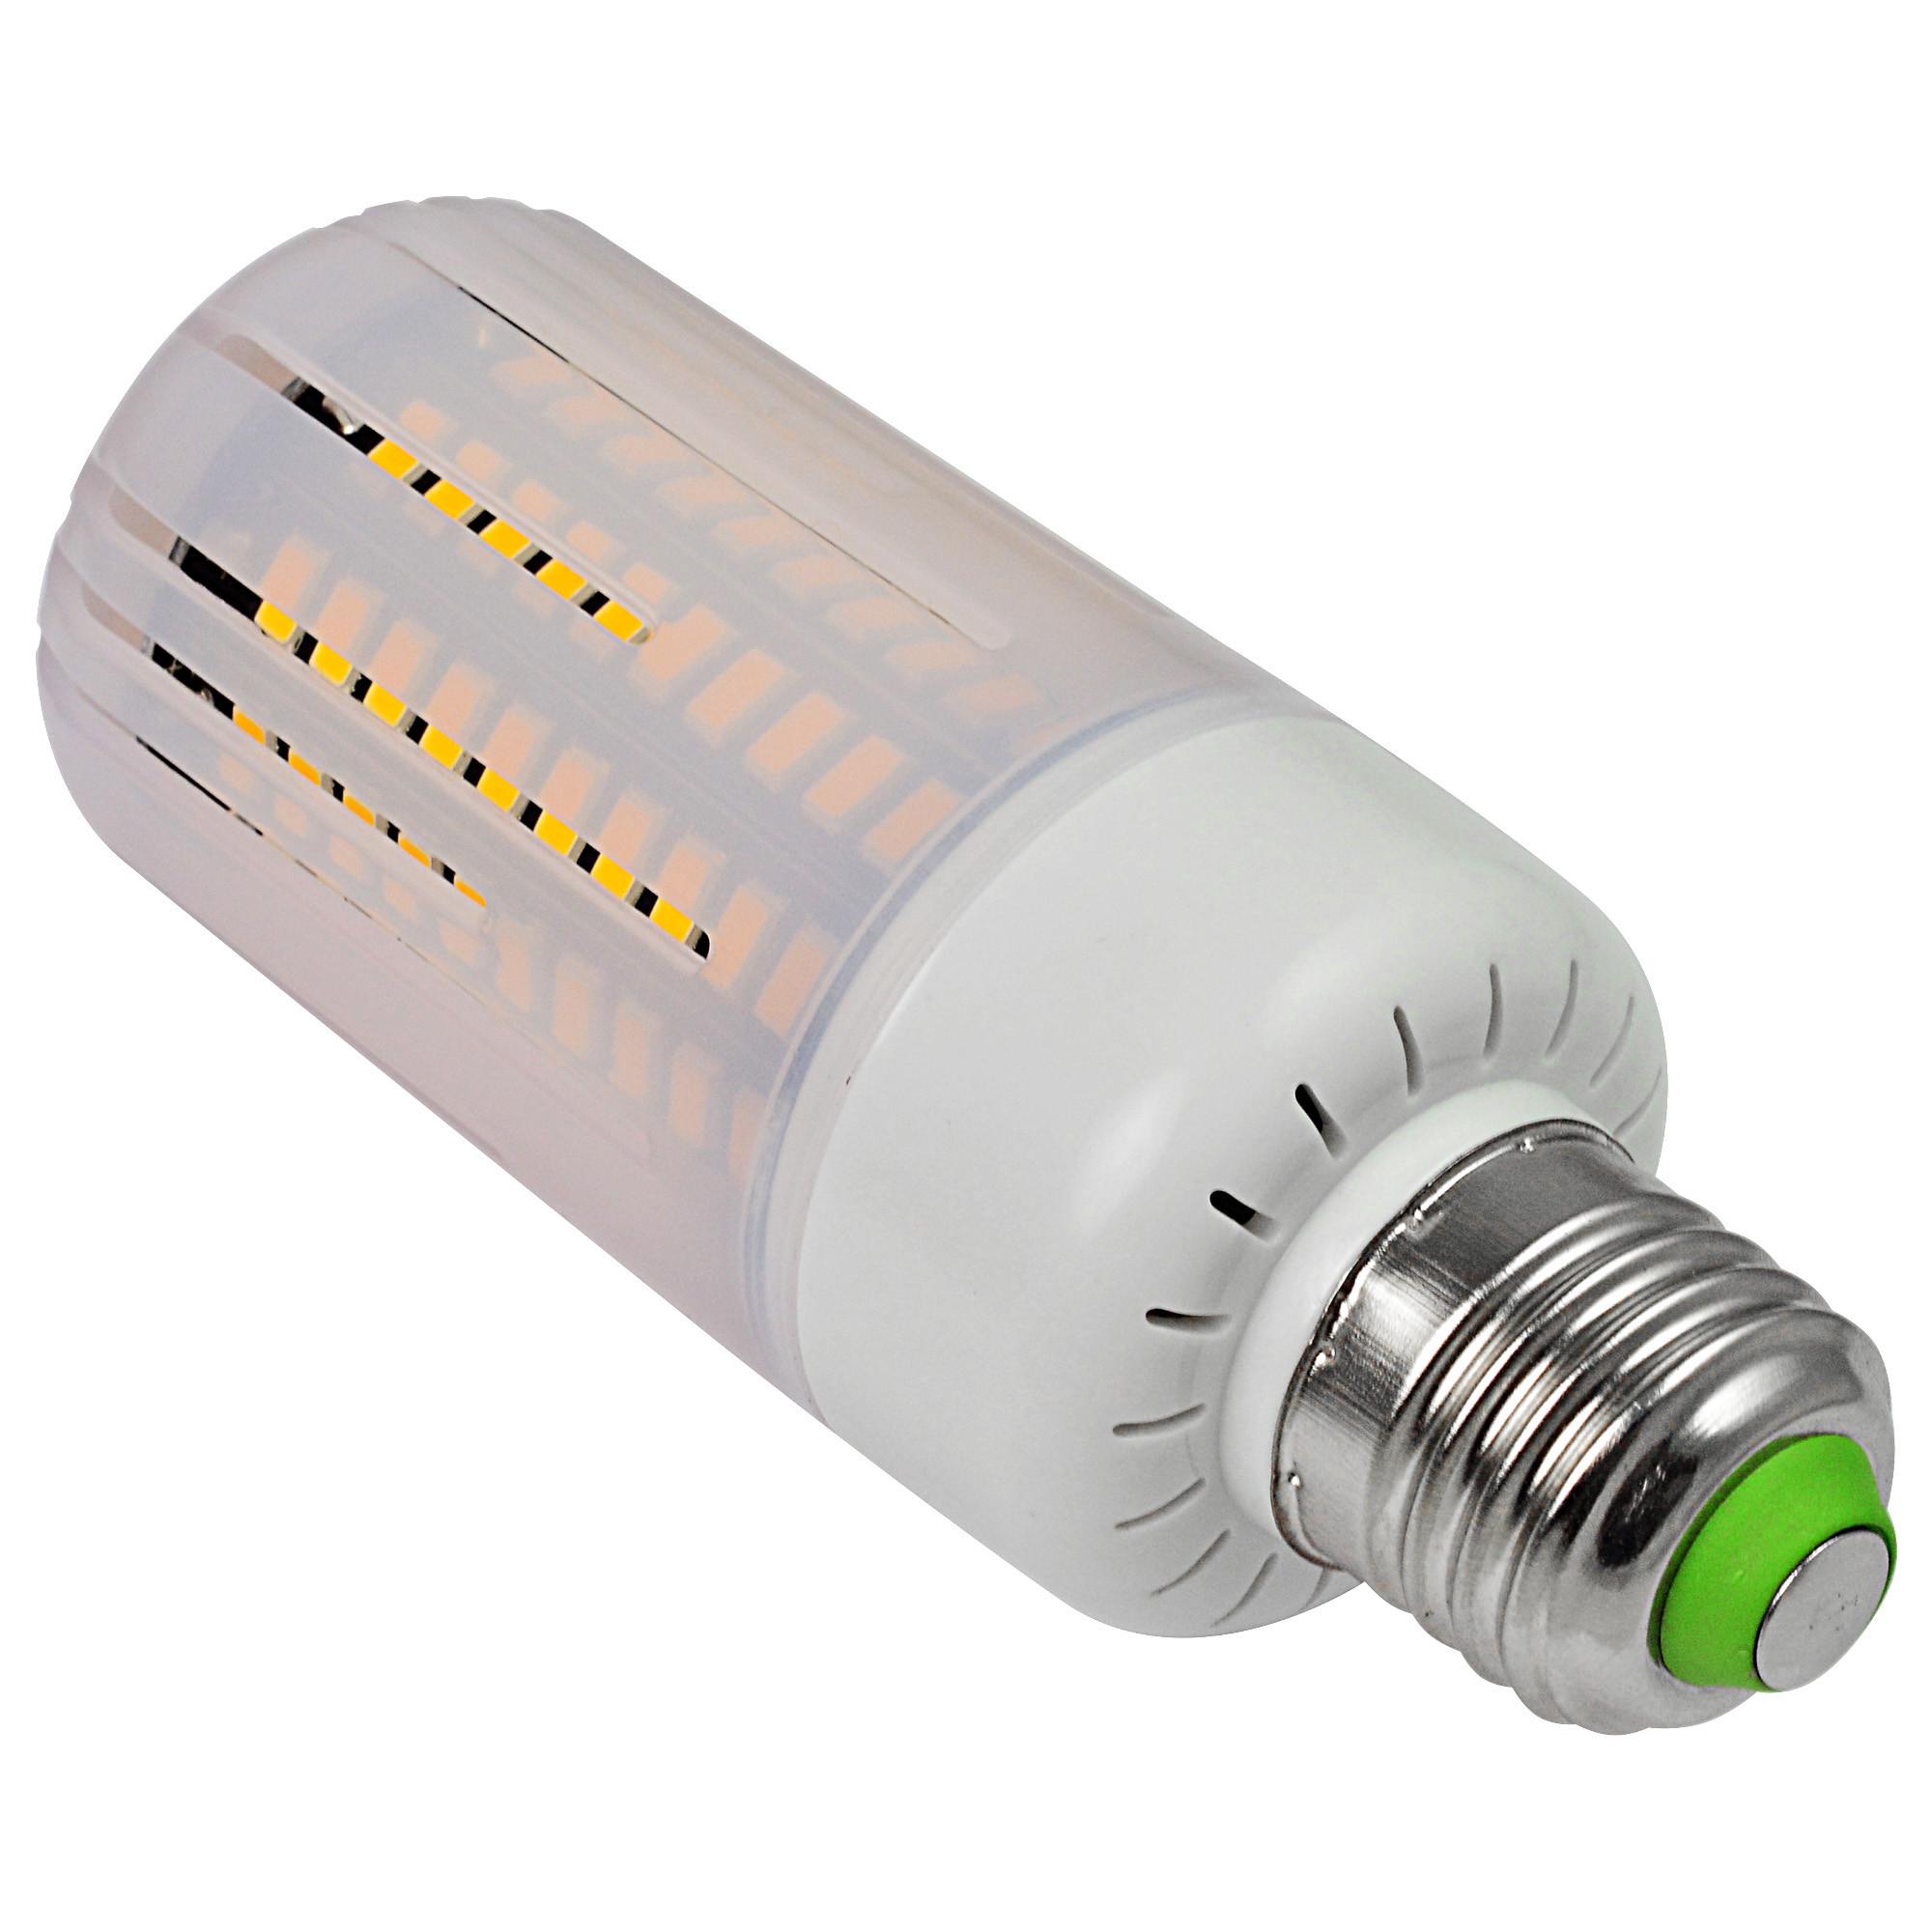 anti strobe e27 15w led corn light 120x 5736 smd lb led bulb lamp in warm white energy saving. Black Bedroom Furniture Sets. Home Design Ideas